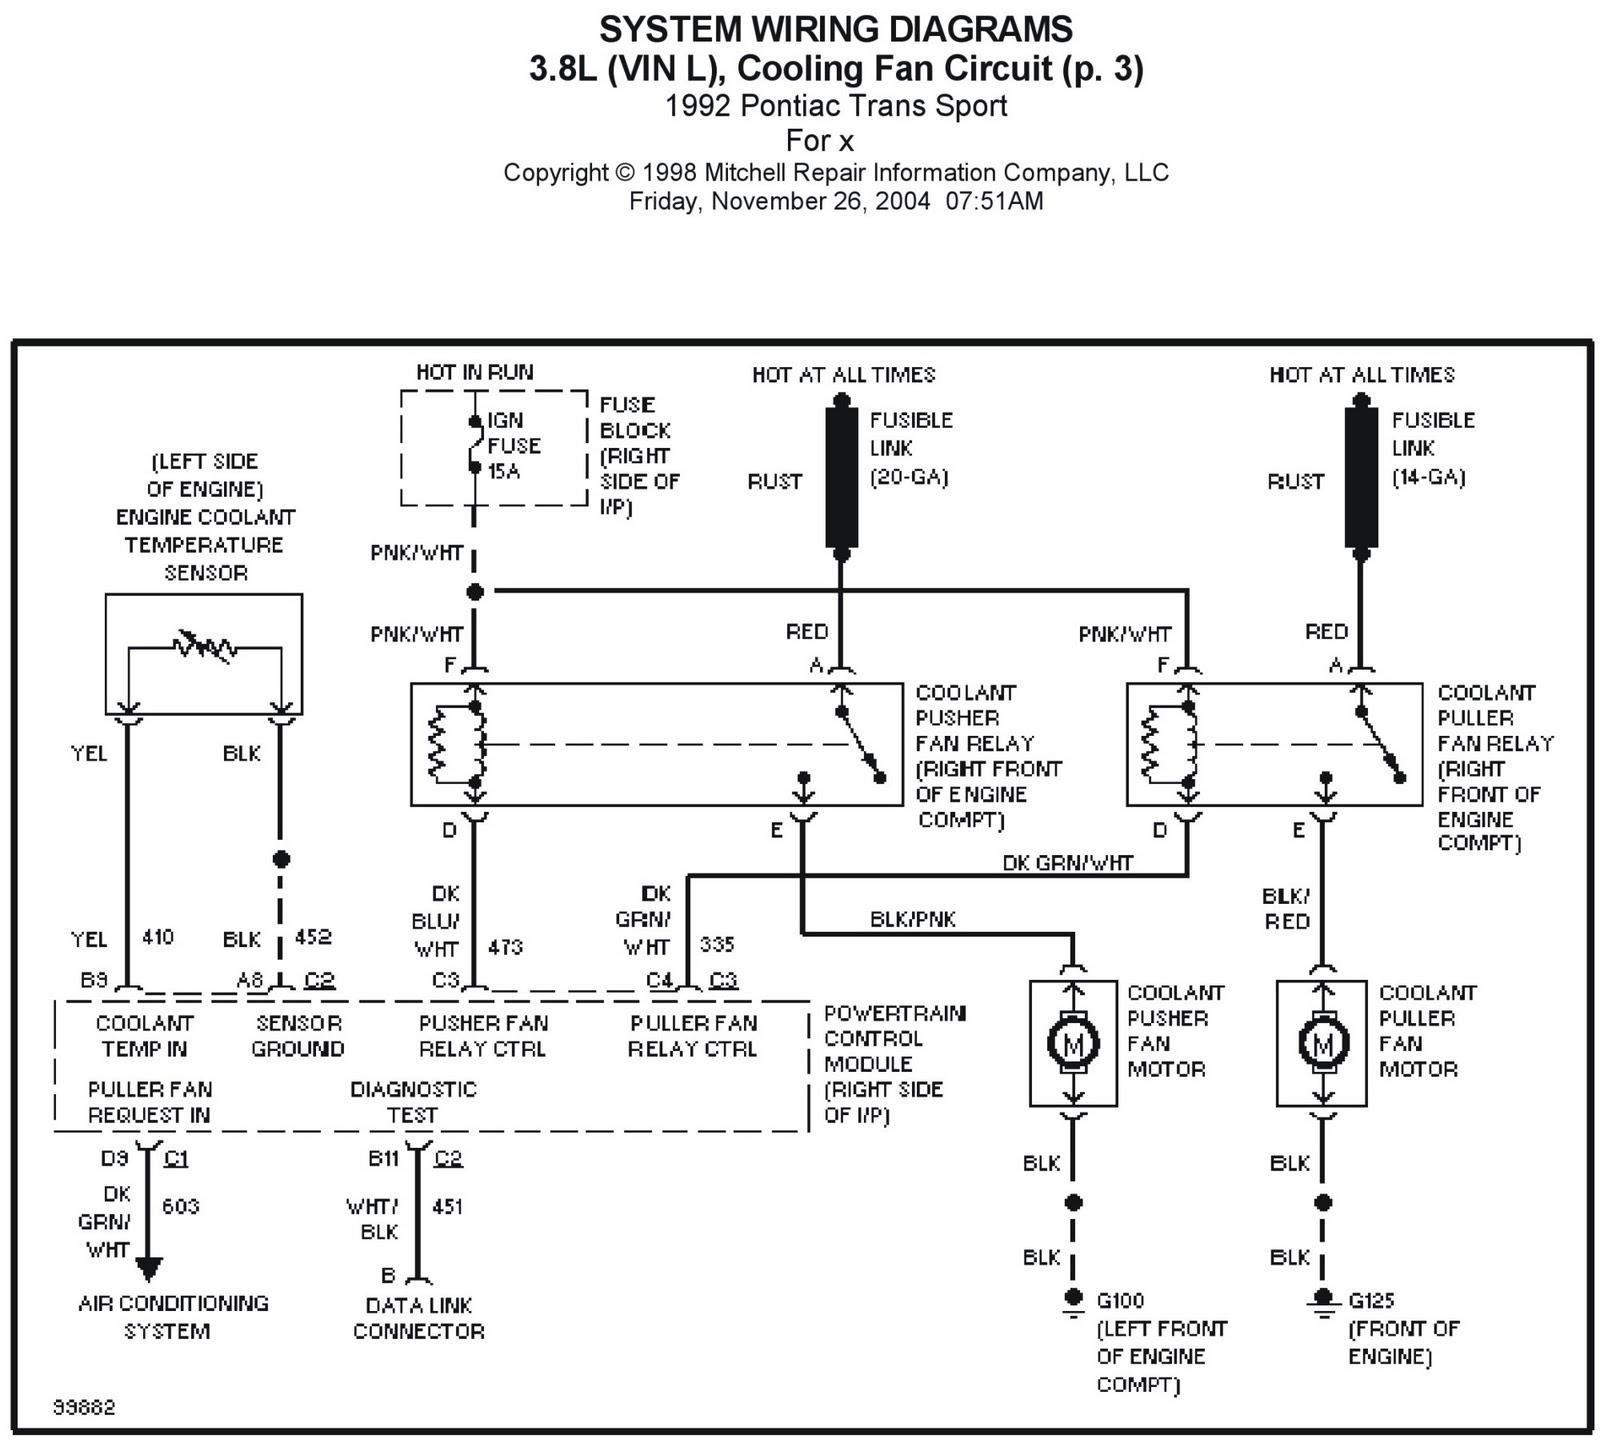 medium resolution of circuit and wiring diagram pontiac trans sport wiring diagram andpontiac trans sport wiring diagram and electrical